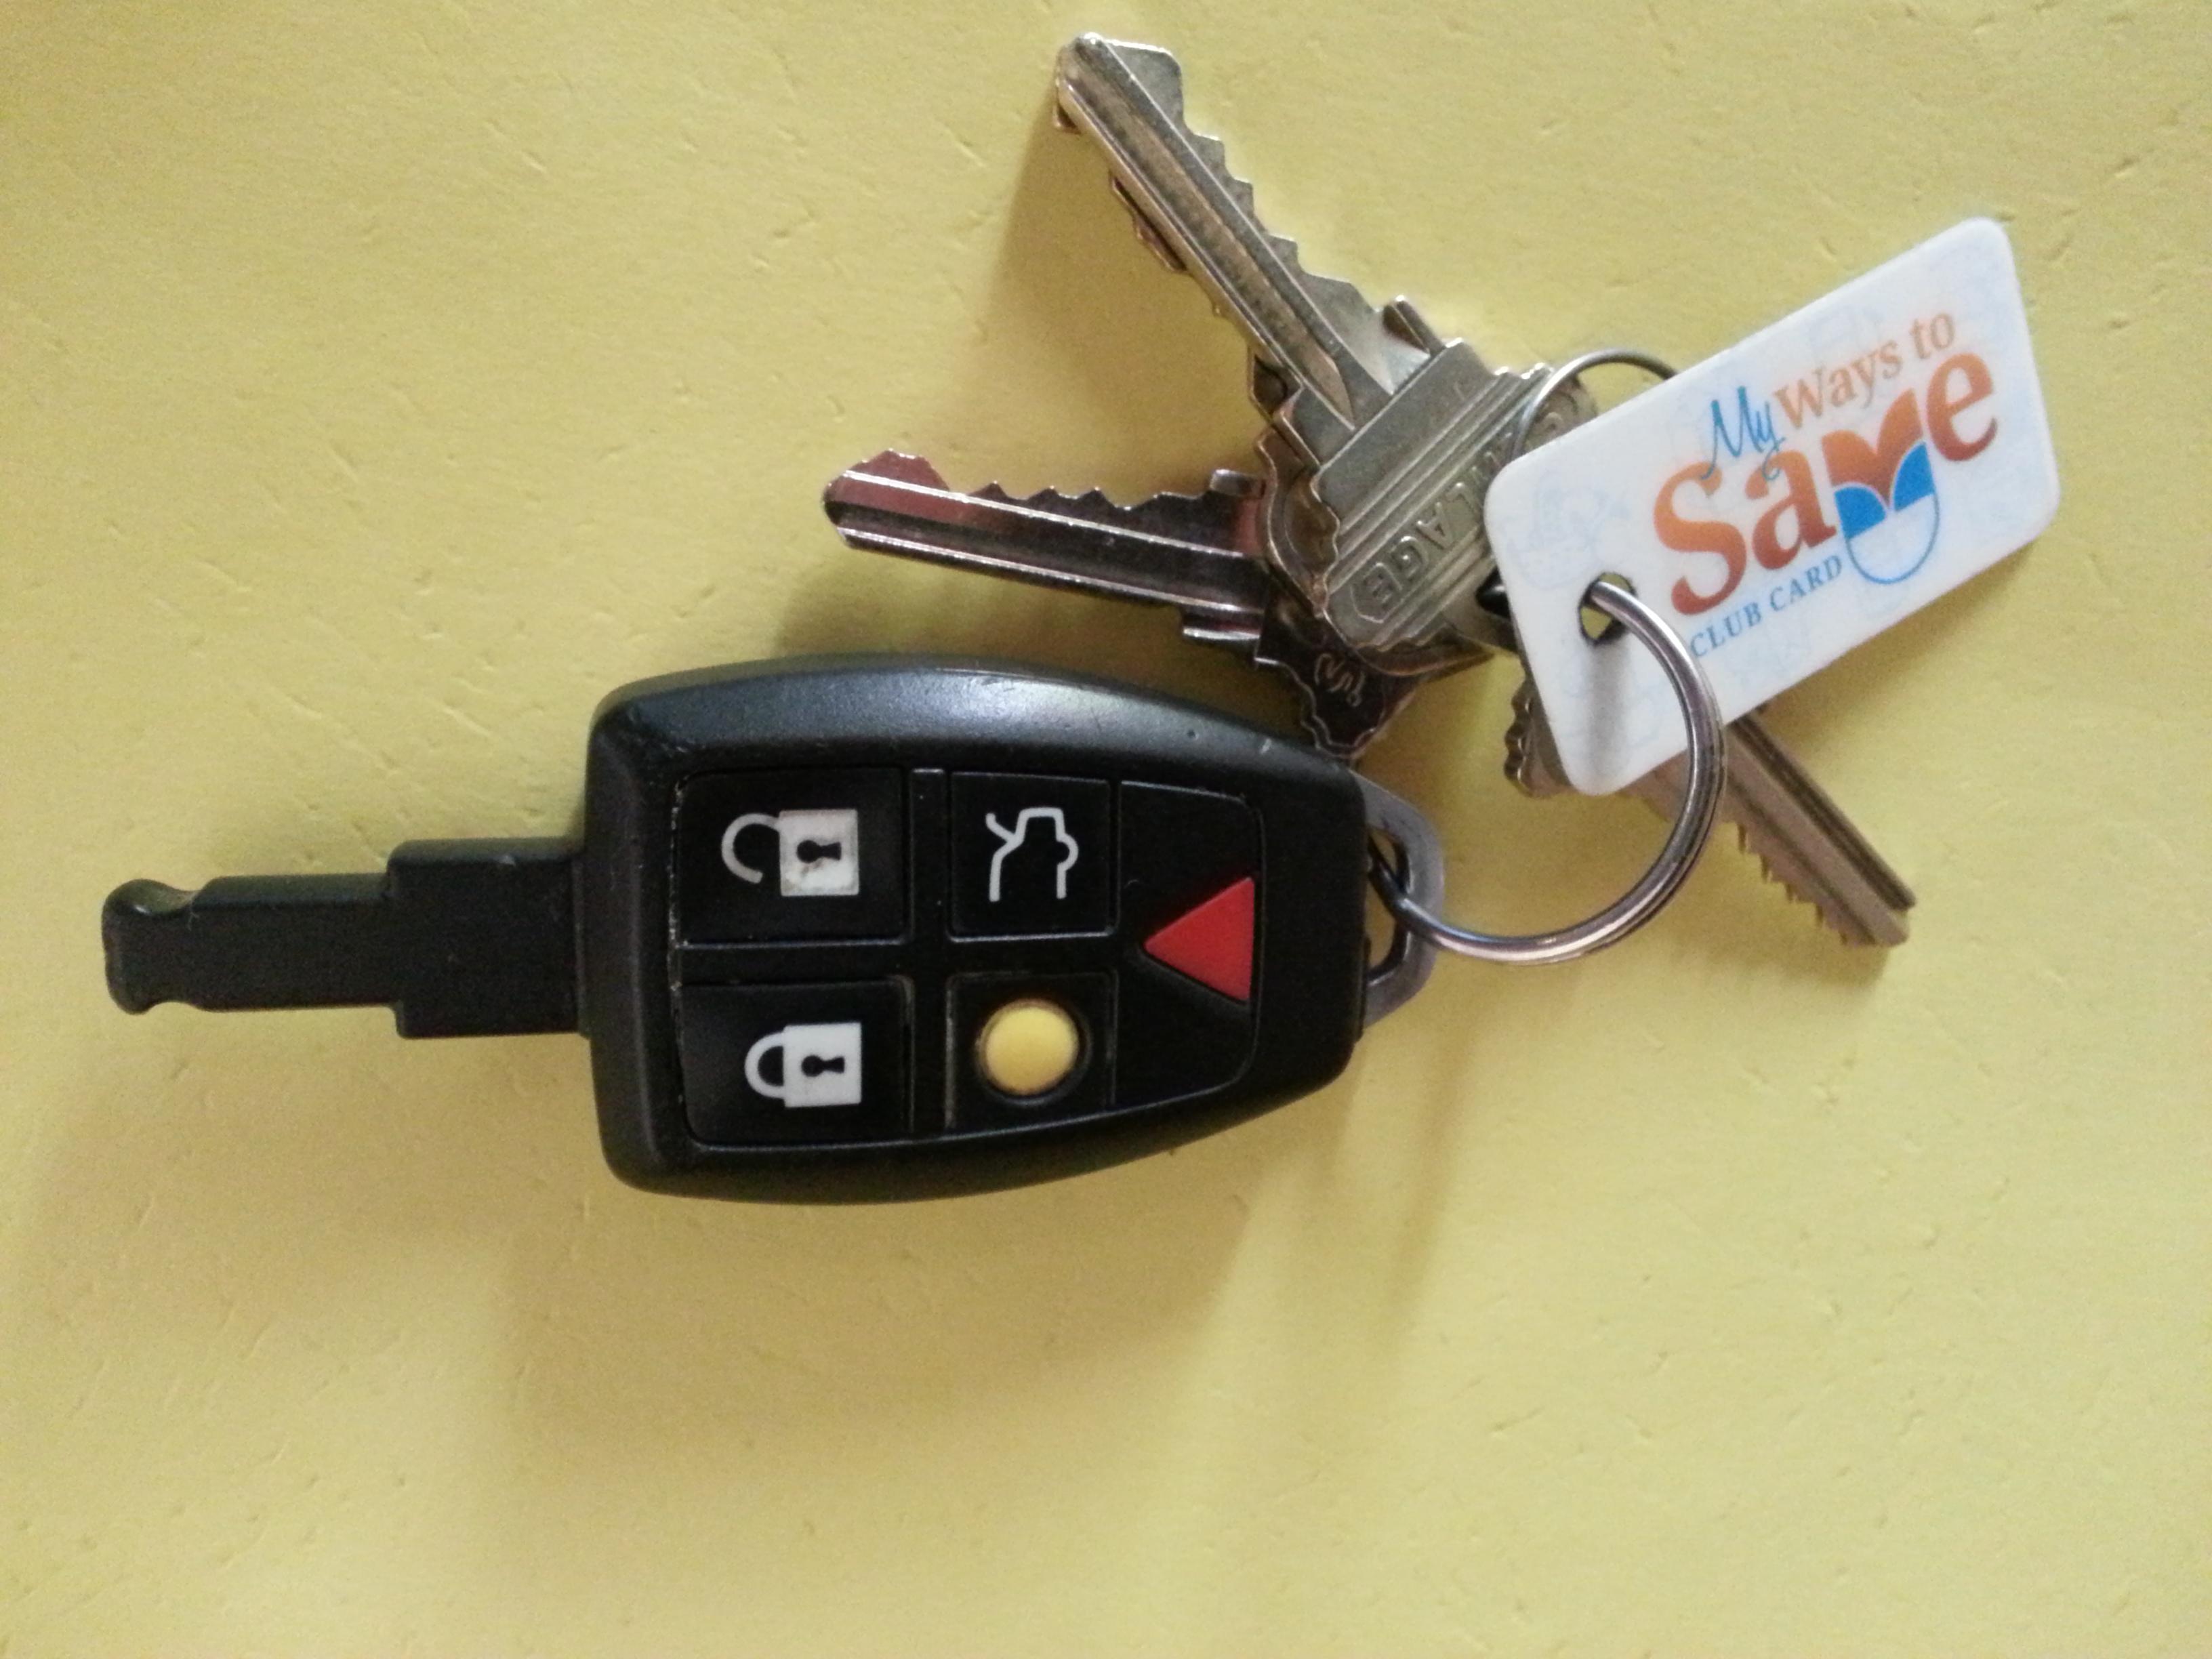 Bette's Key Fob